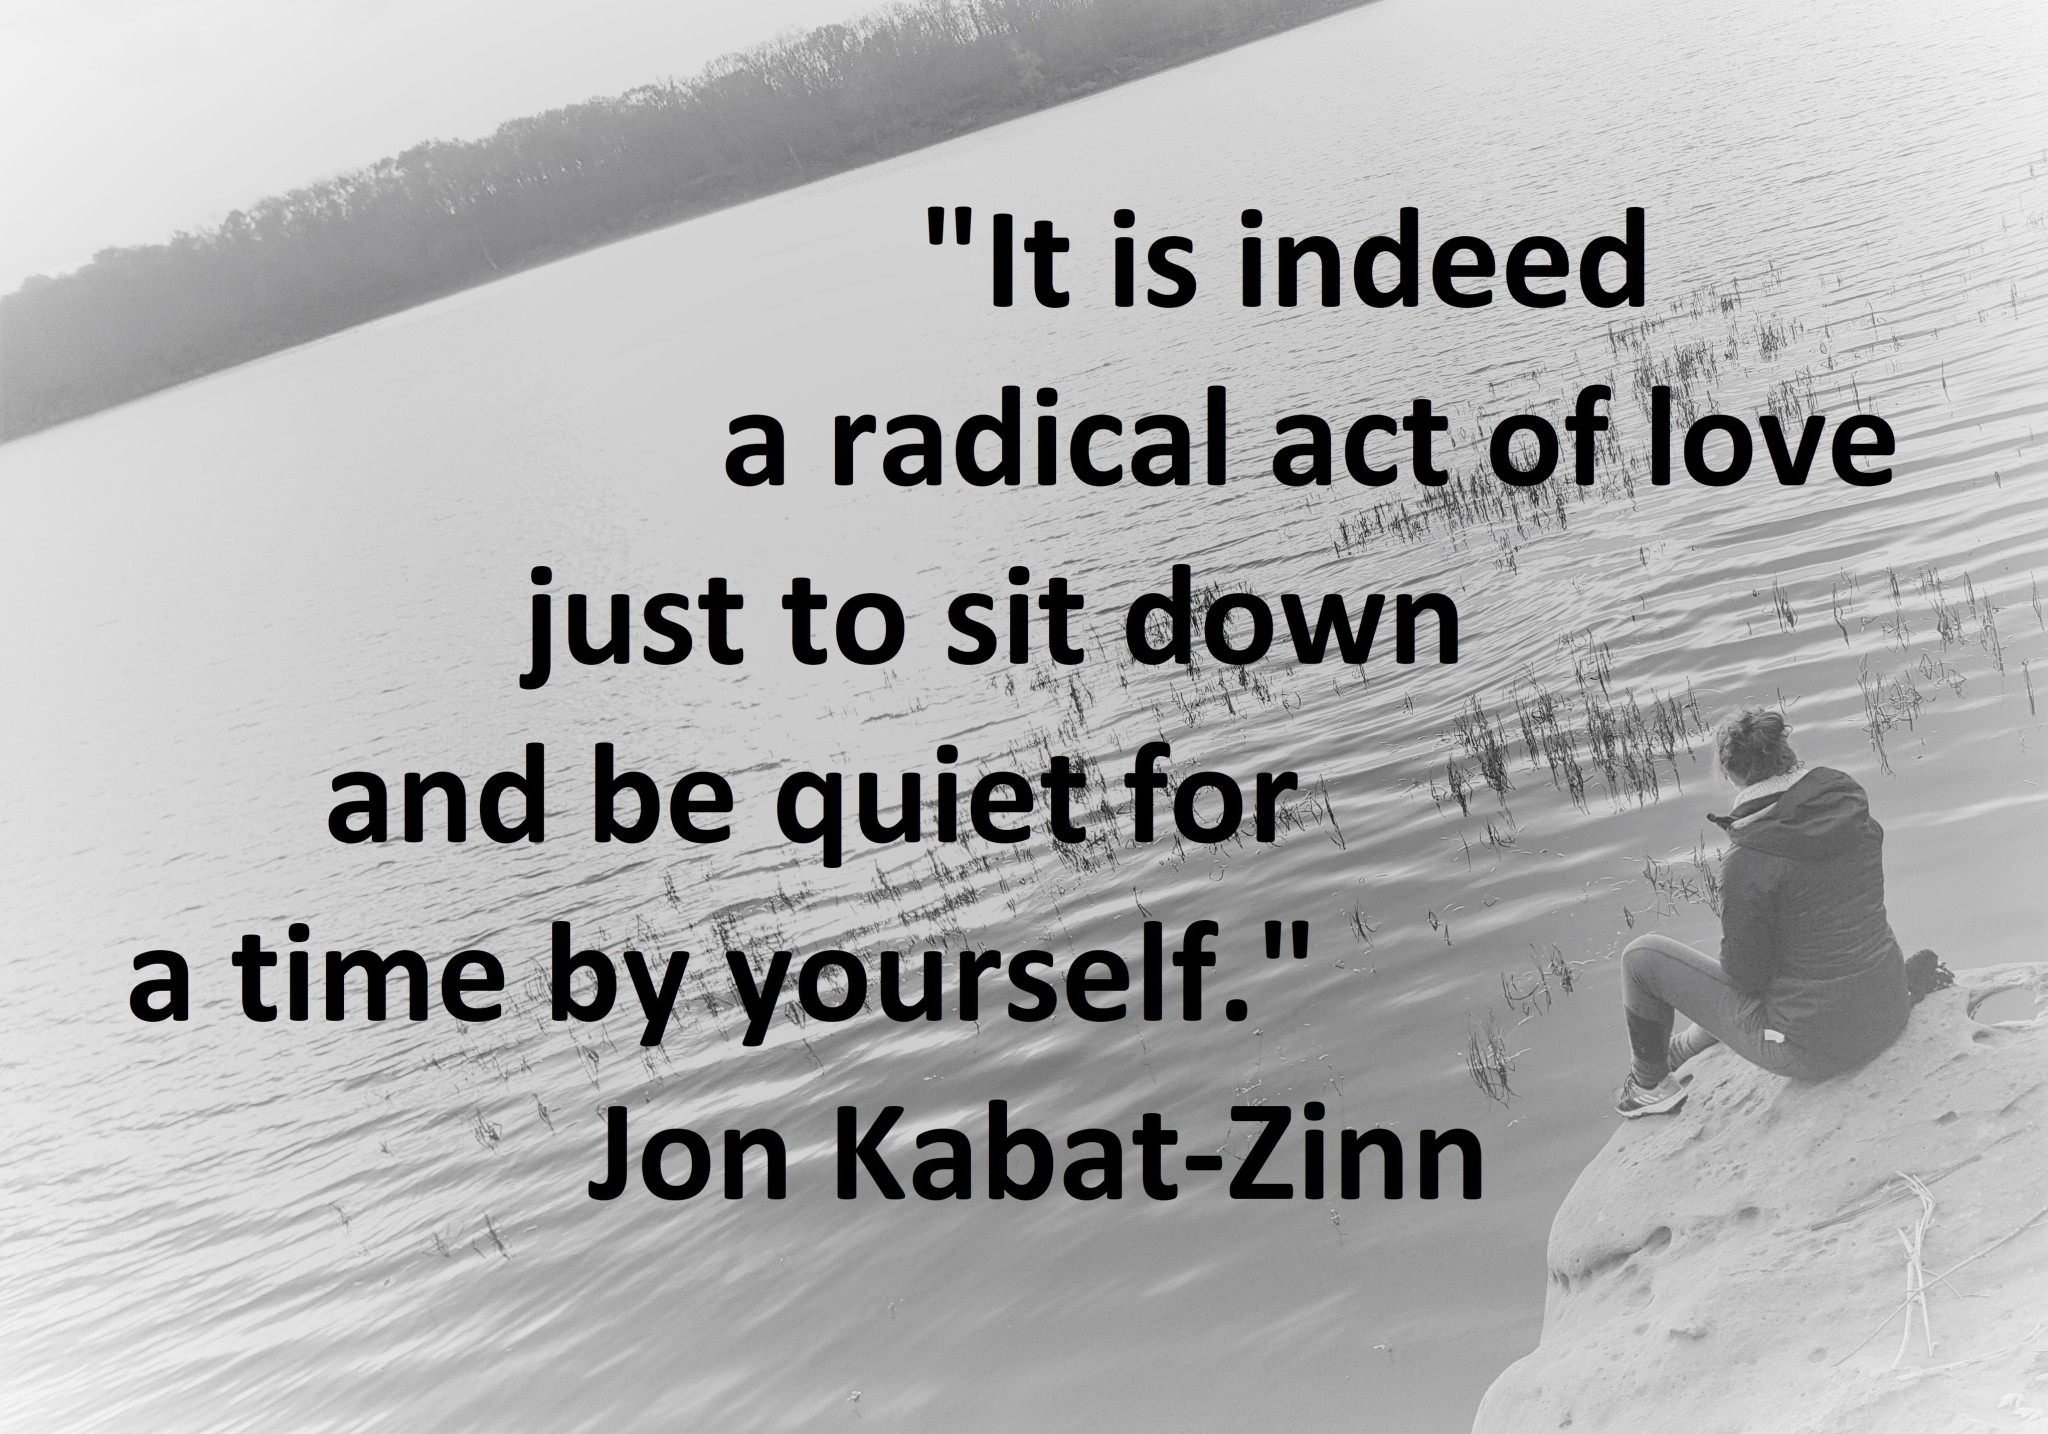 Jon Kabat-Zinn - Time By Yourself